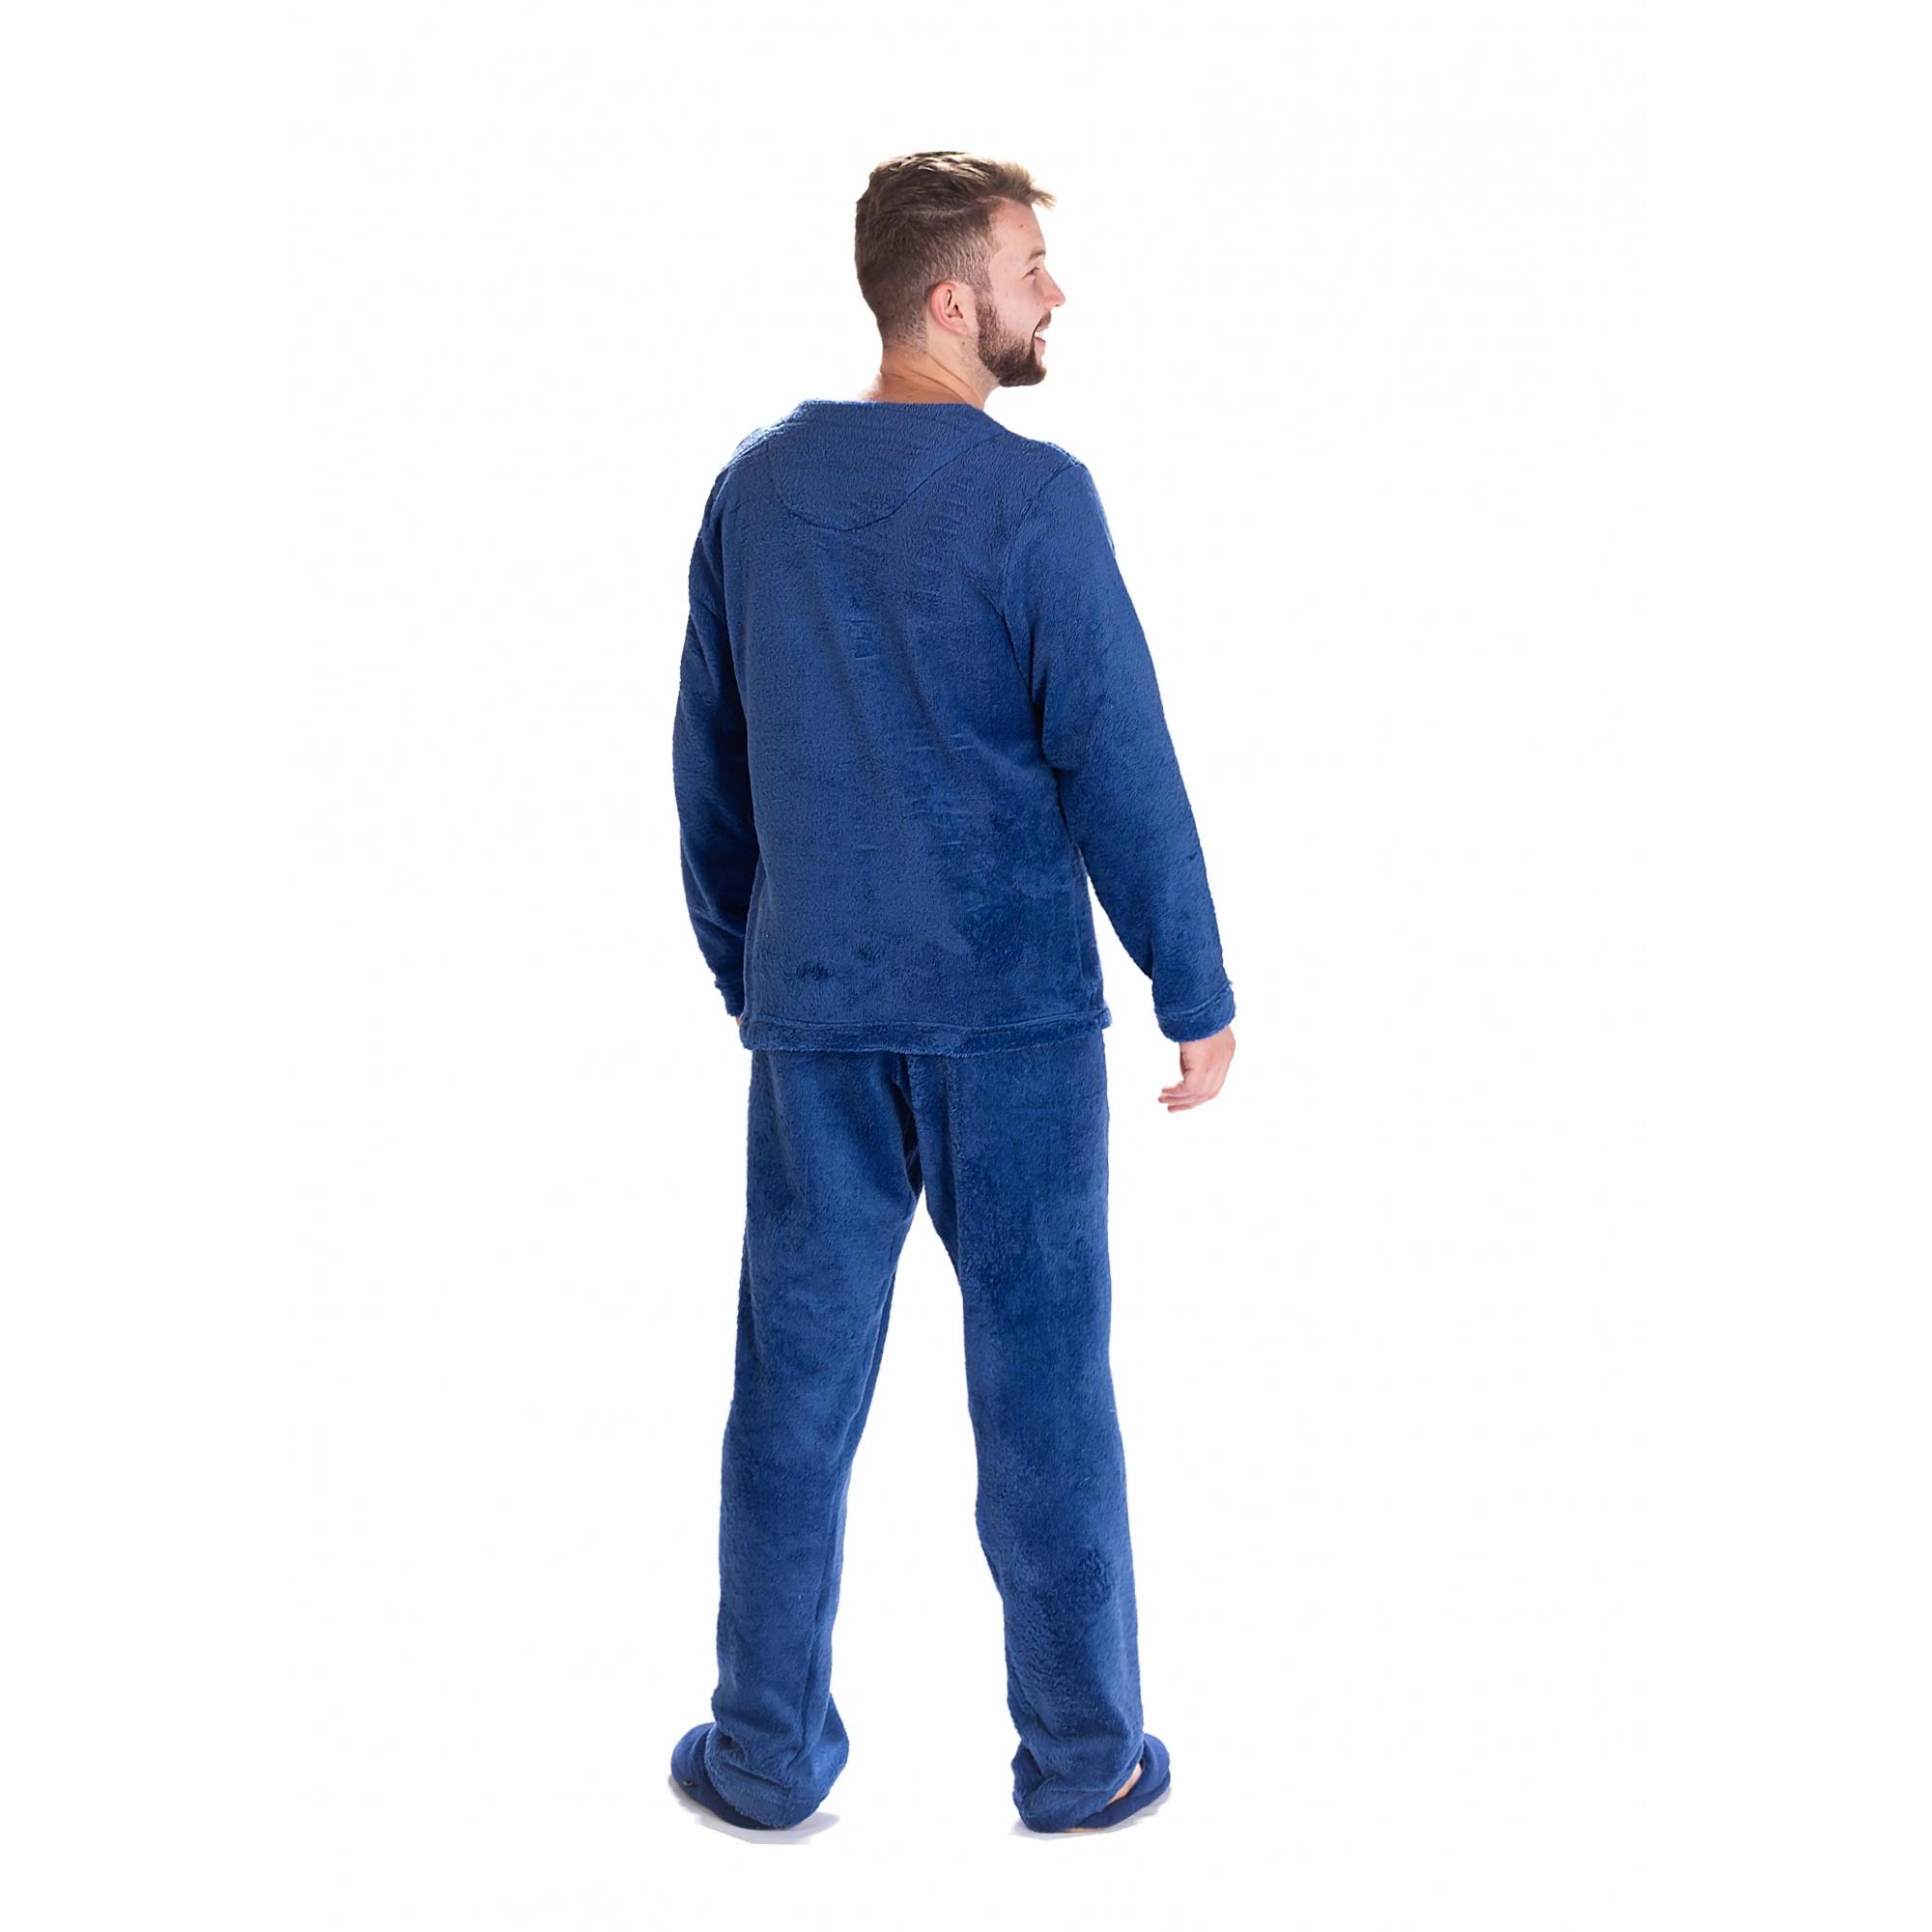 Pijama Masculino Vairelli Inverno Fleece Poliéster Alexandre  - Vairelli Chinelos Pijamas Robes